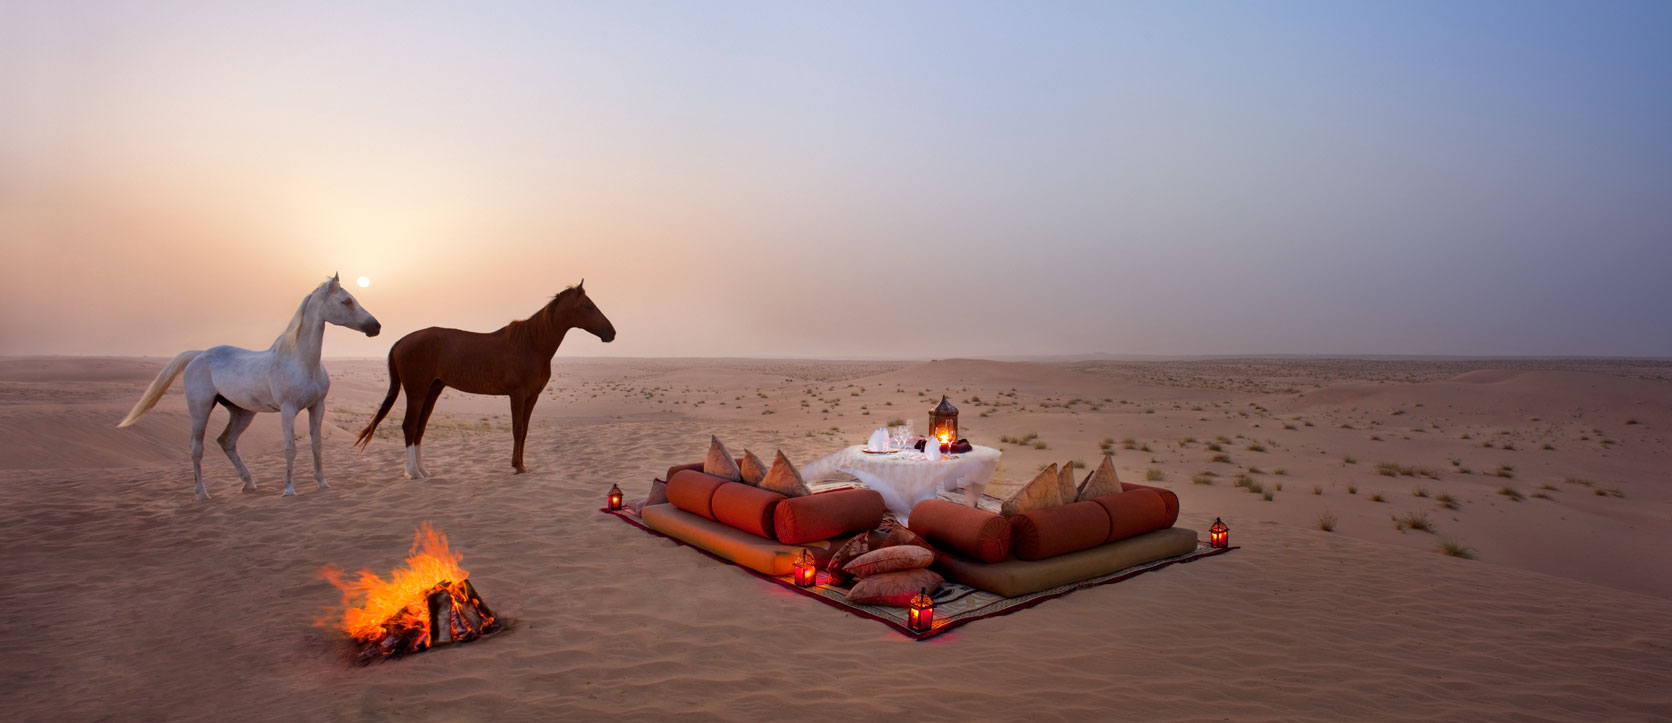 jld_romantic_desert_dining-Bab-Al-Shams